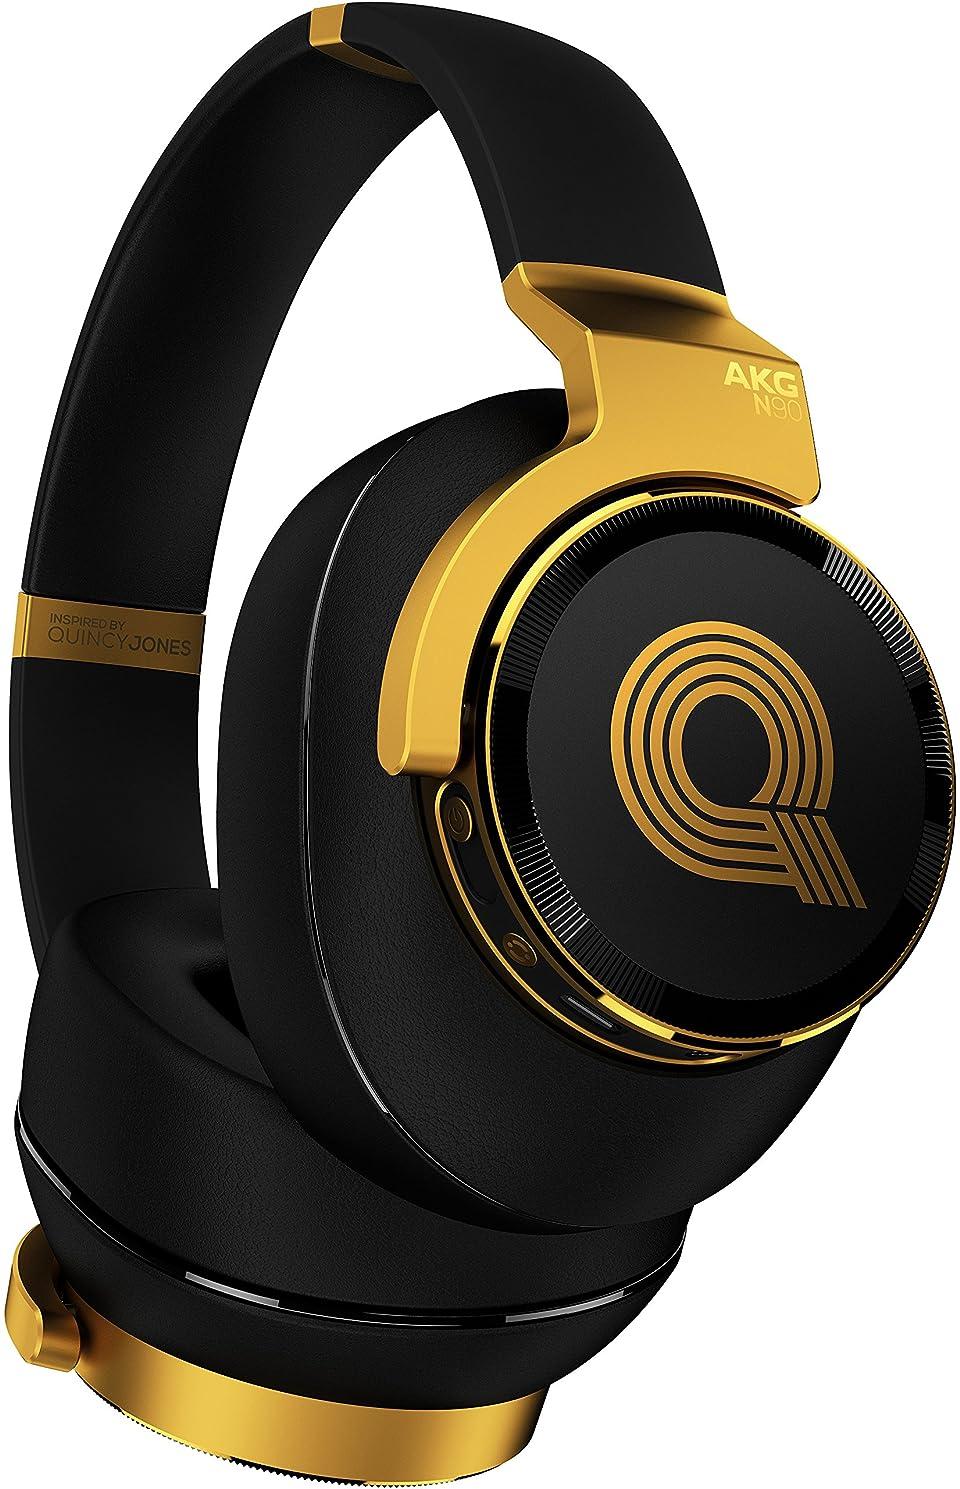 AKG sealed over-ear headphones N90Q (Black / Gold)(Japan domestic regular goods)